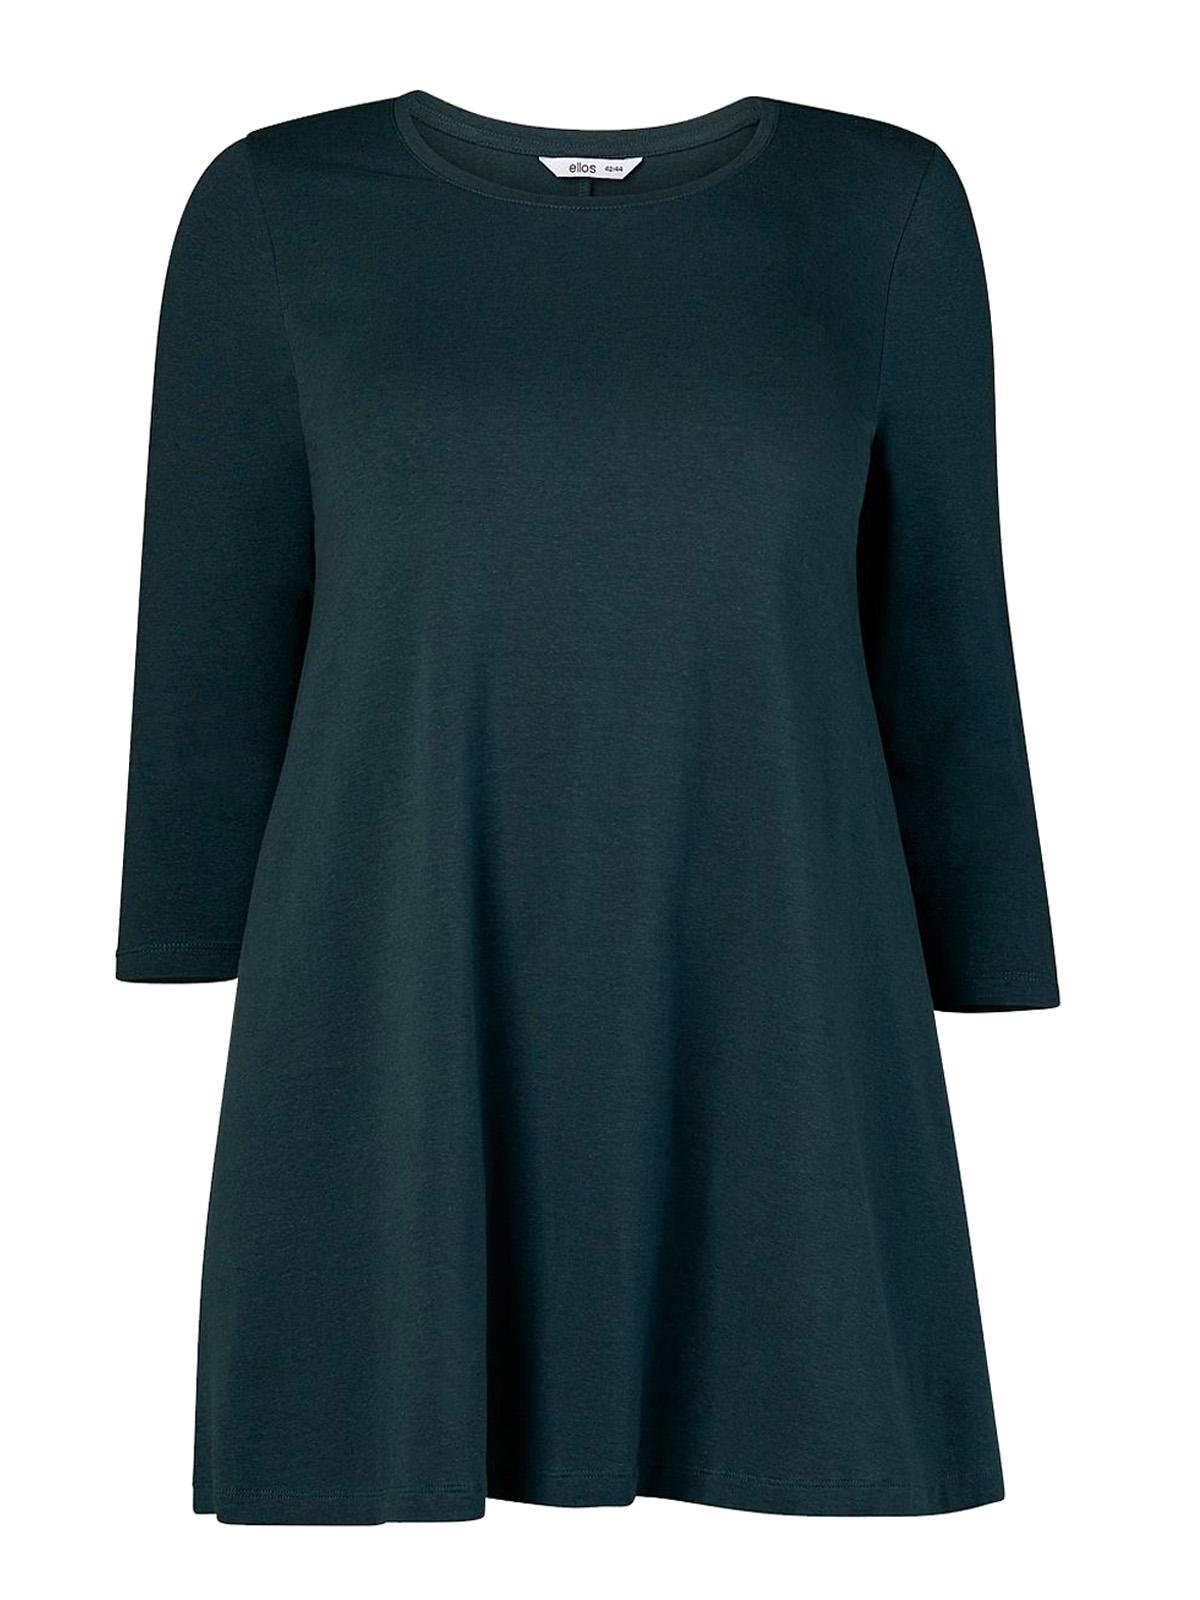 Ellos Ellos Dark Green Cotton Jersey A Line Tunic